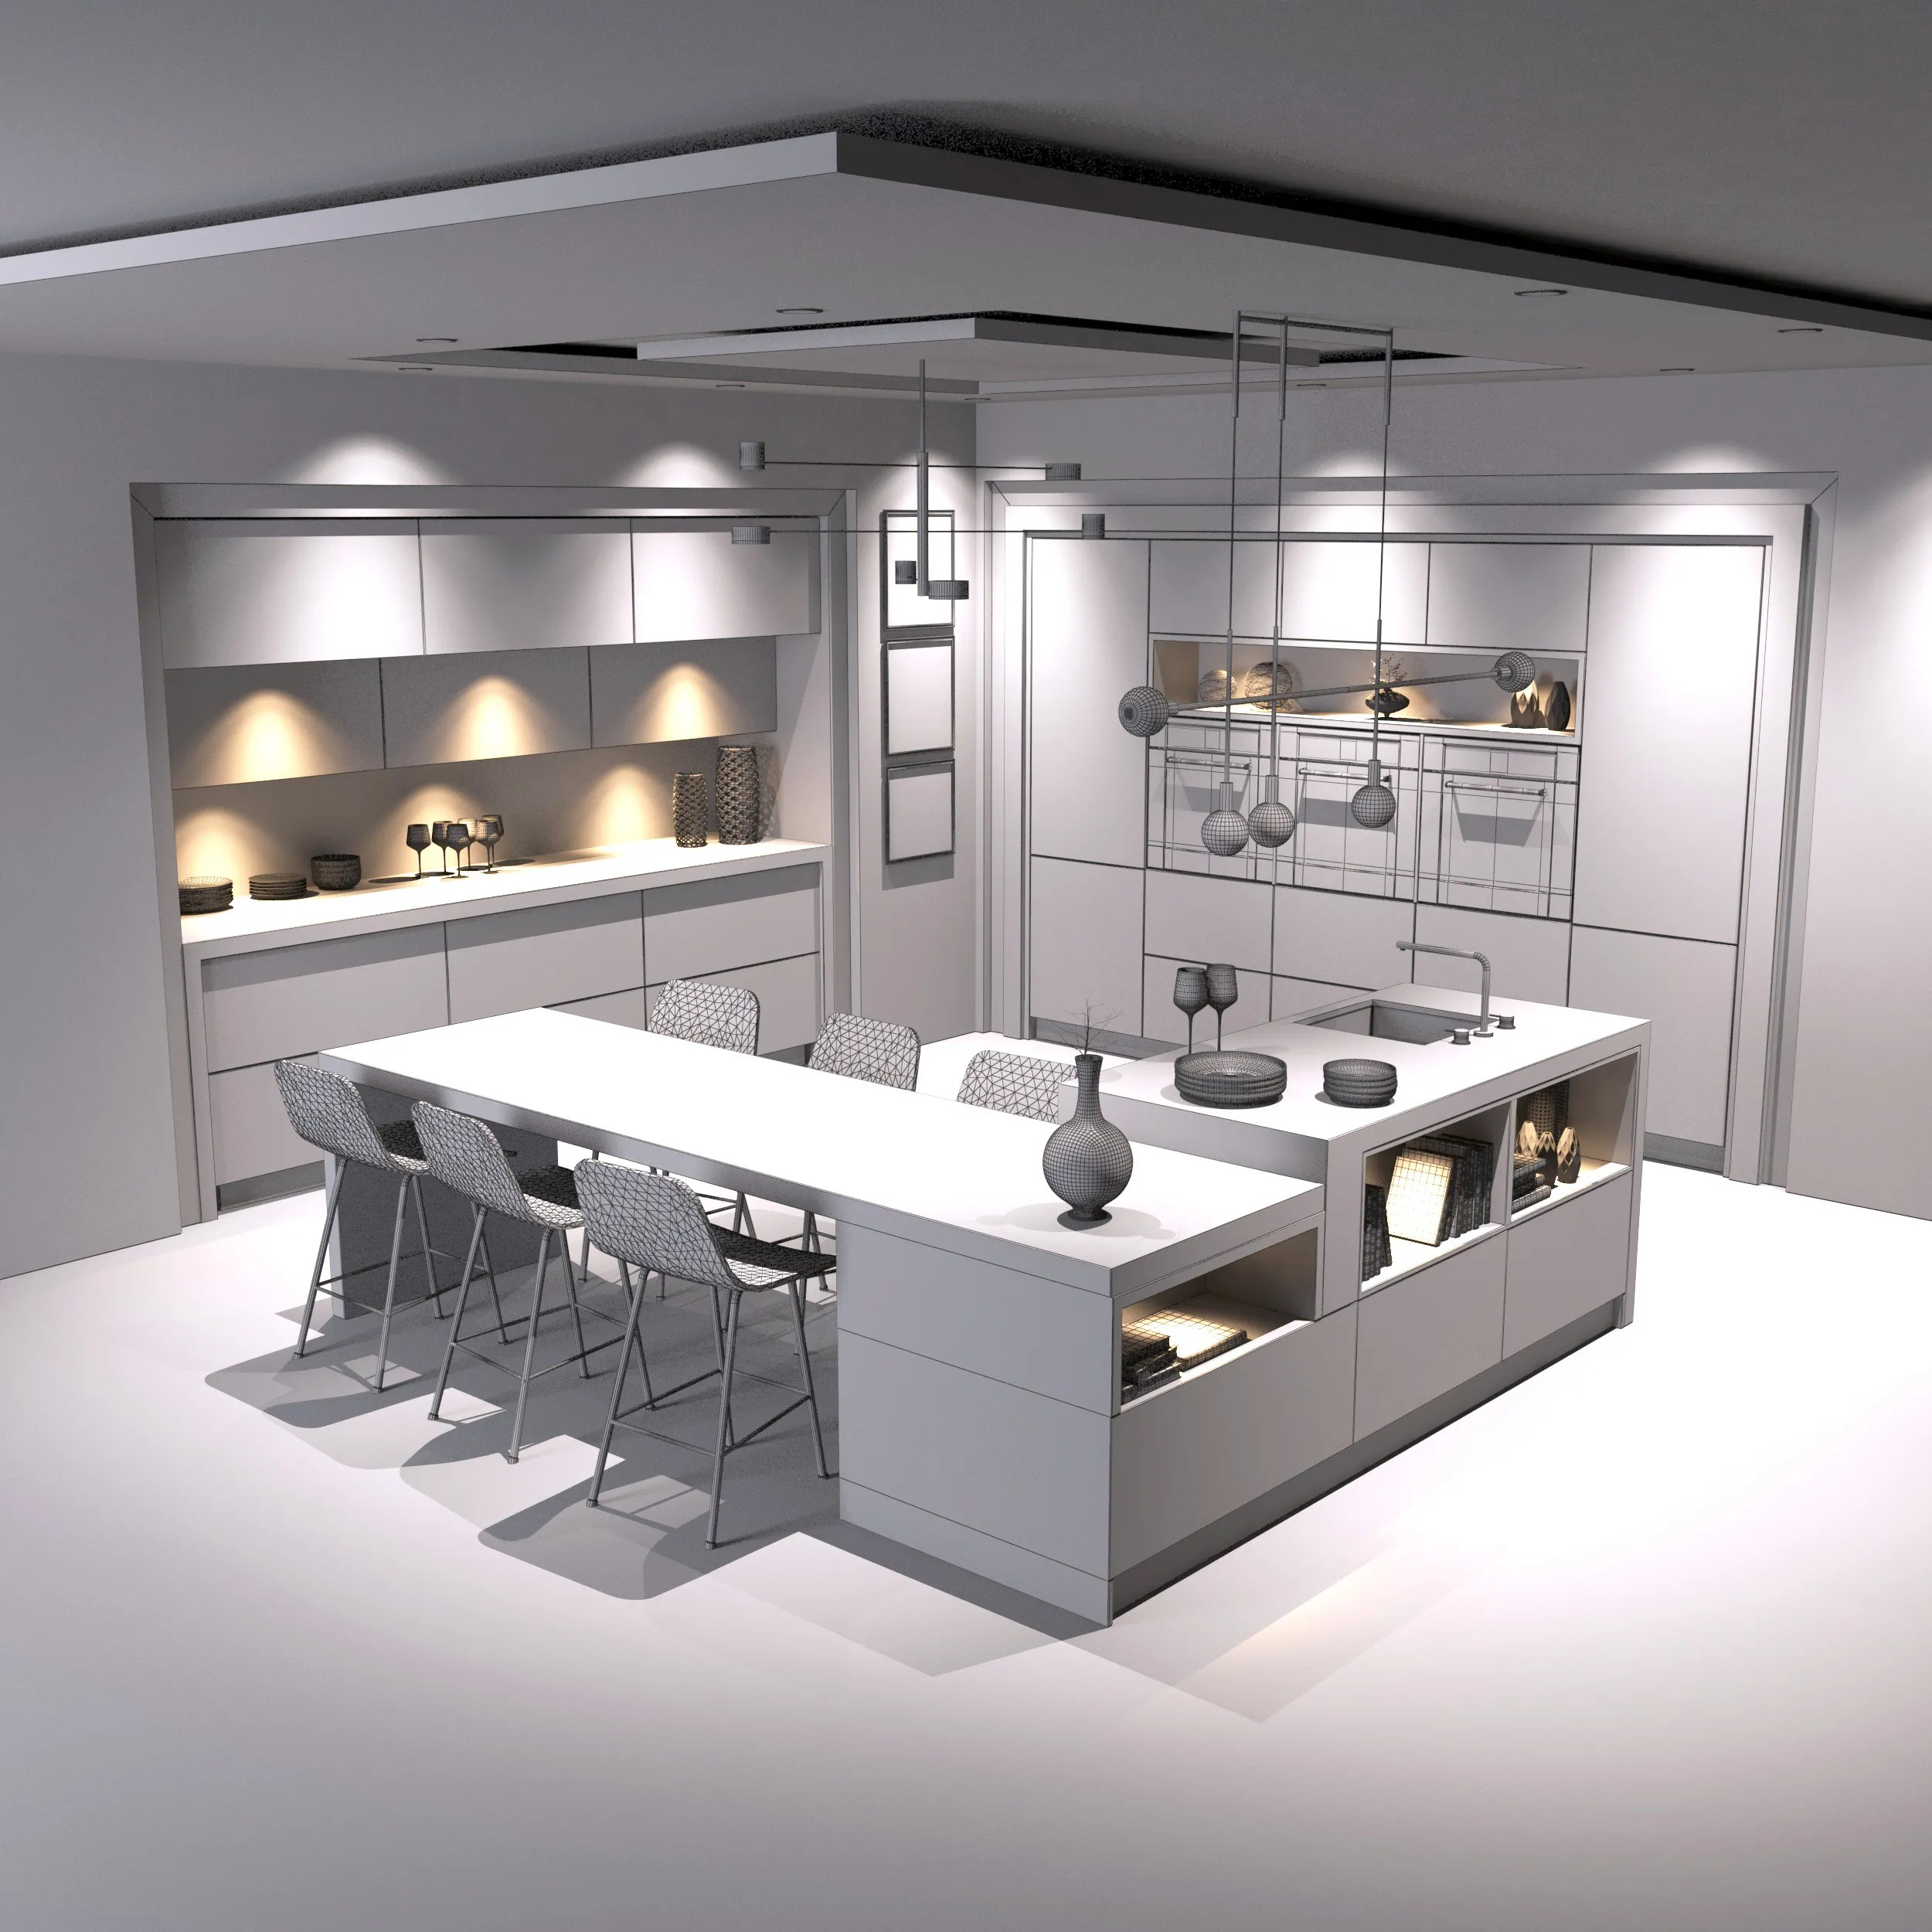 Modern Kitchen 3D Model - FlatPyramid on Model Kitchens  id=99308